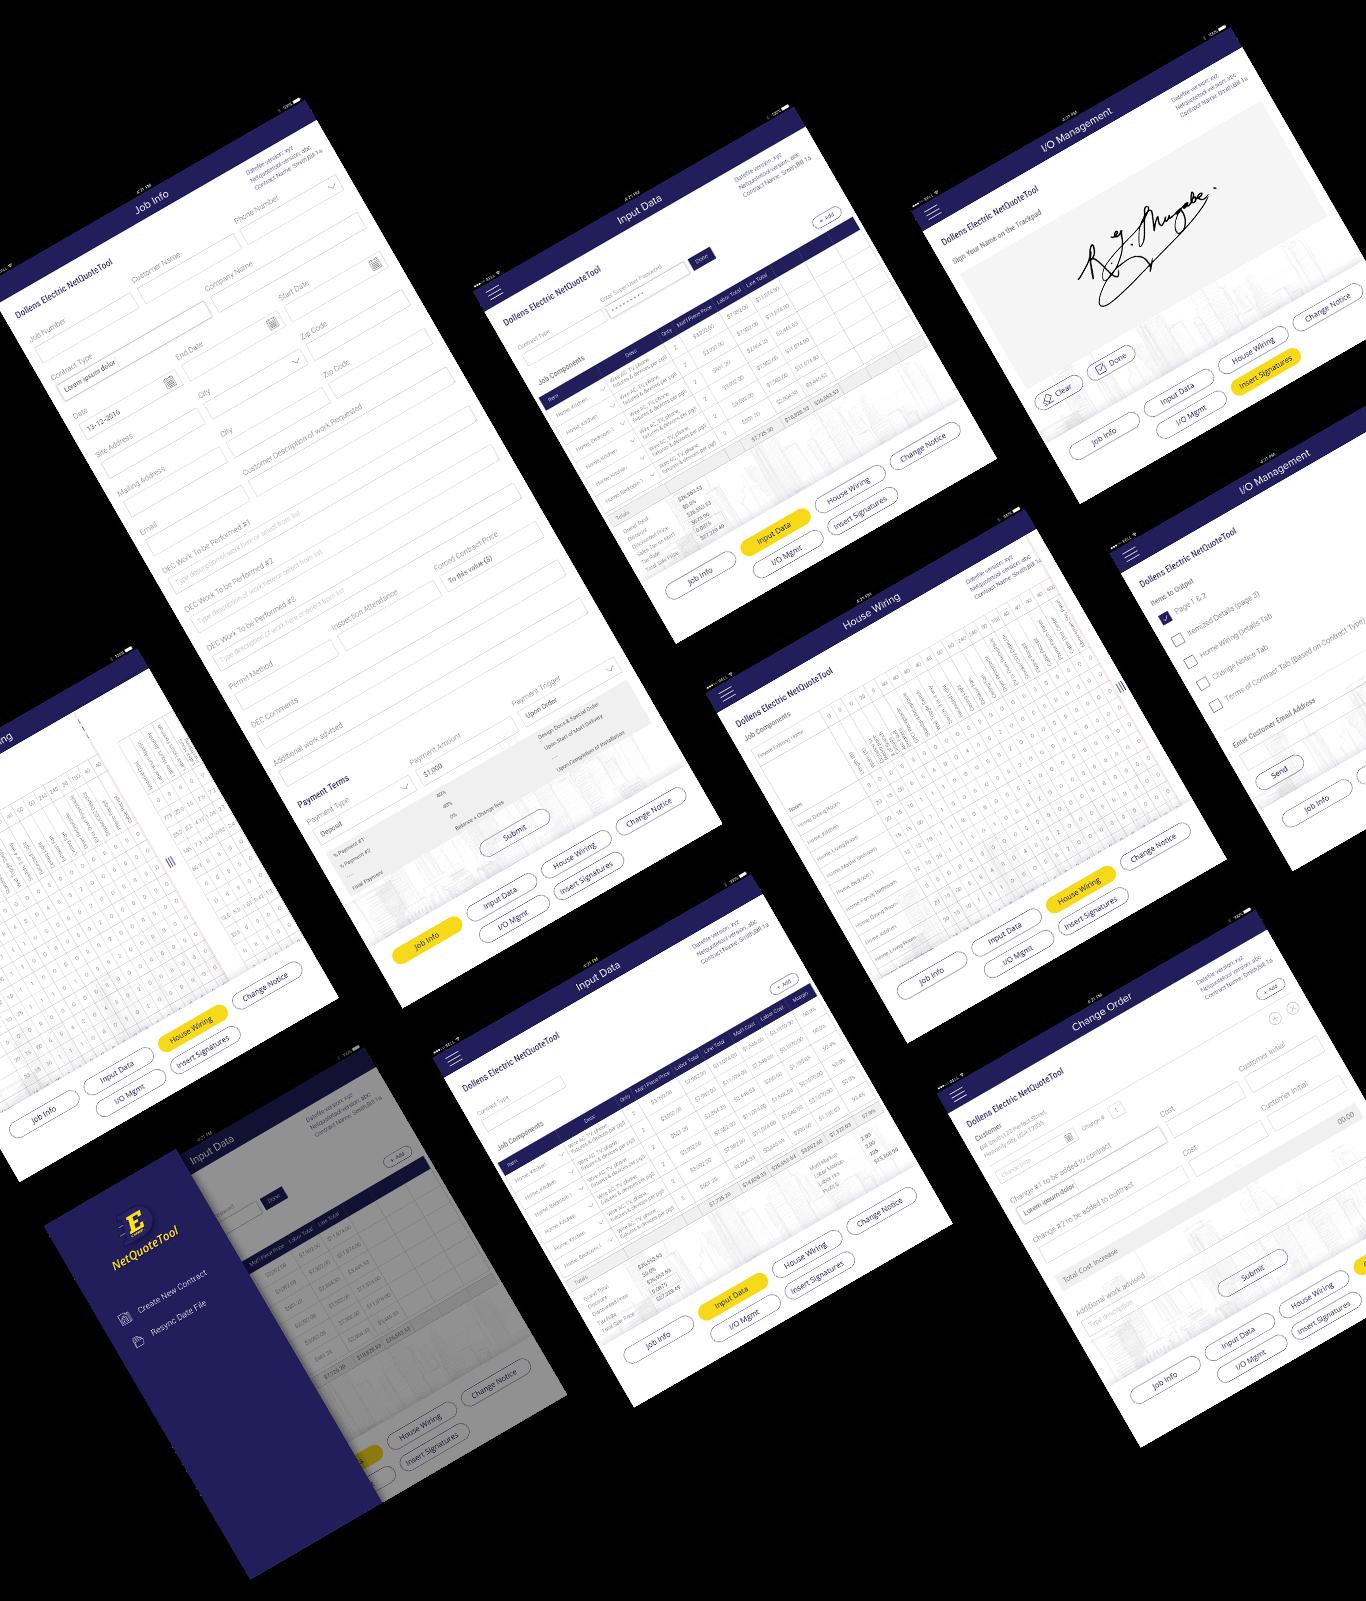 Netquote app screens